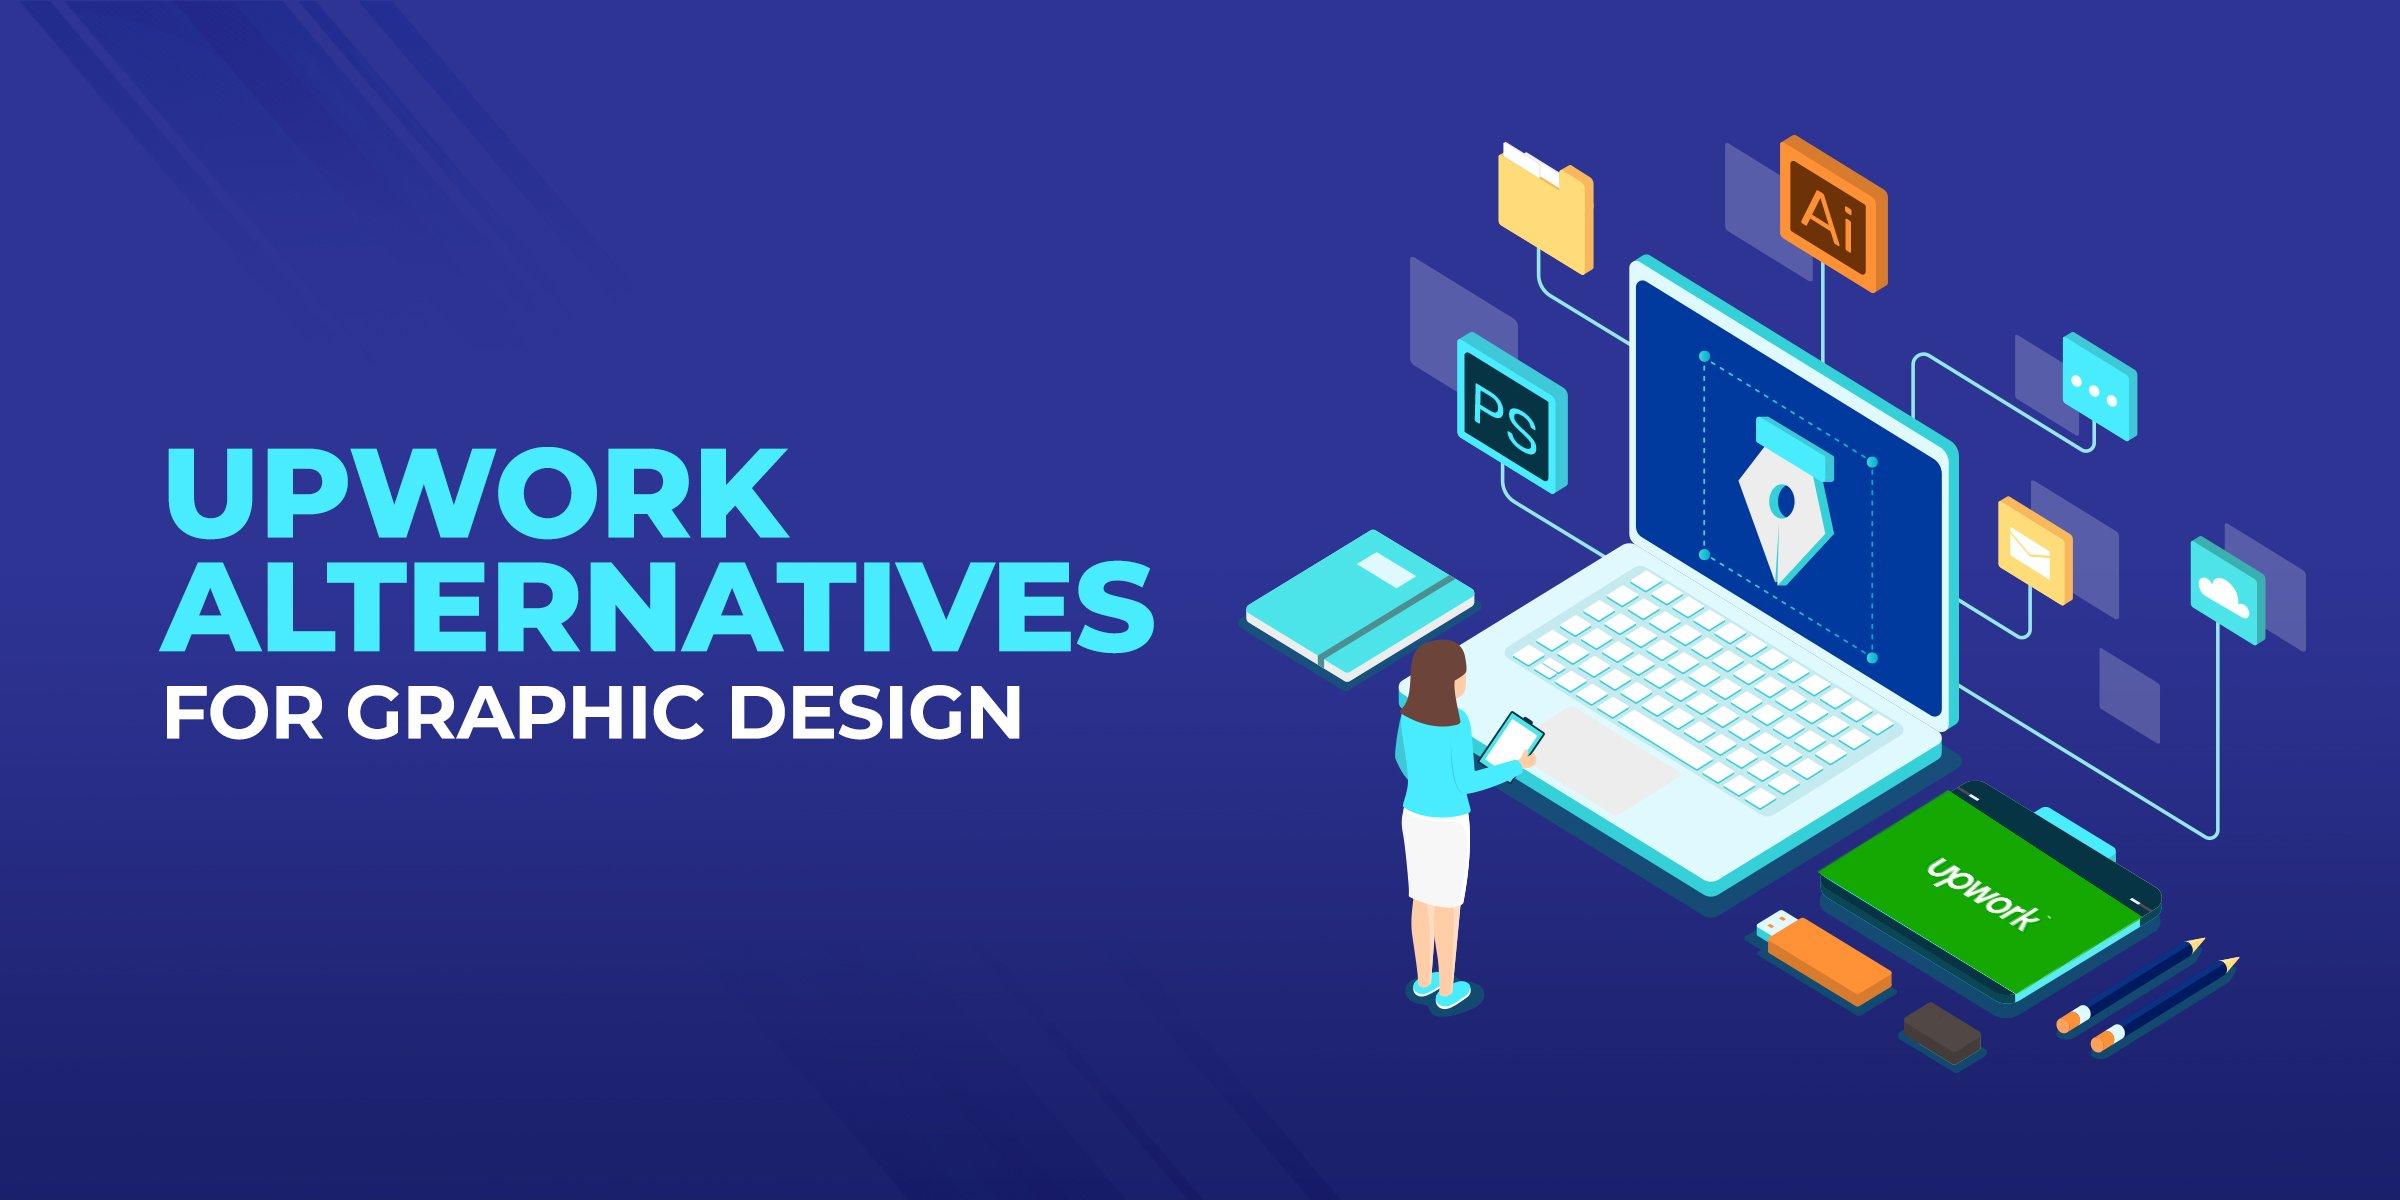 Upwork Alternatives for Graphic Design